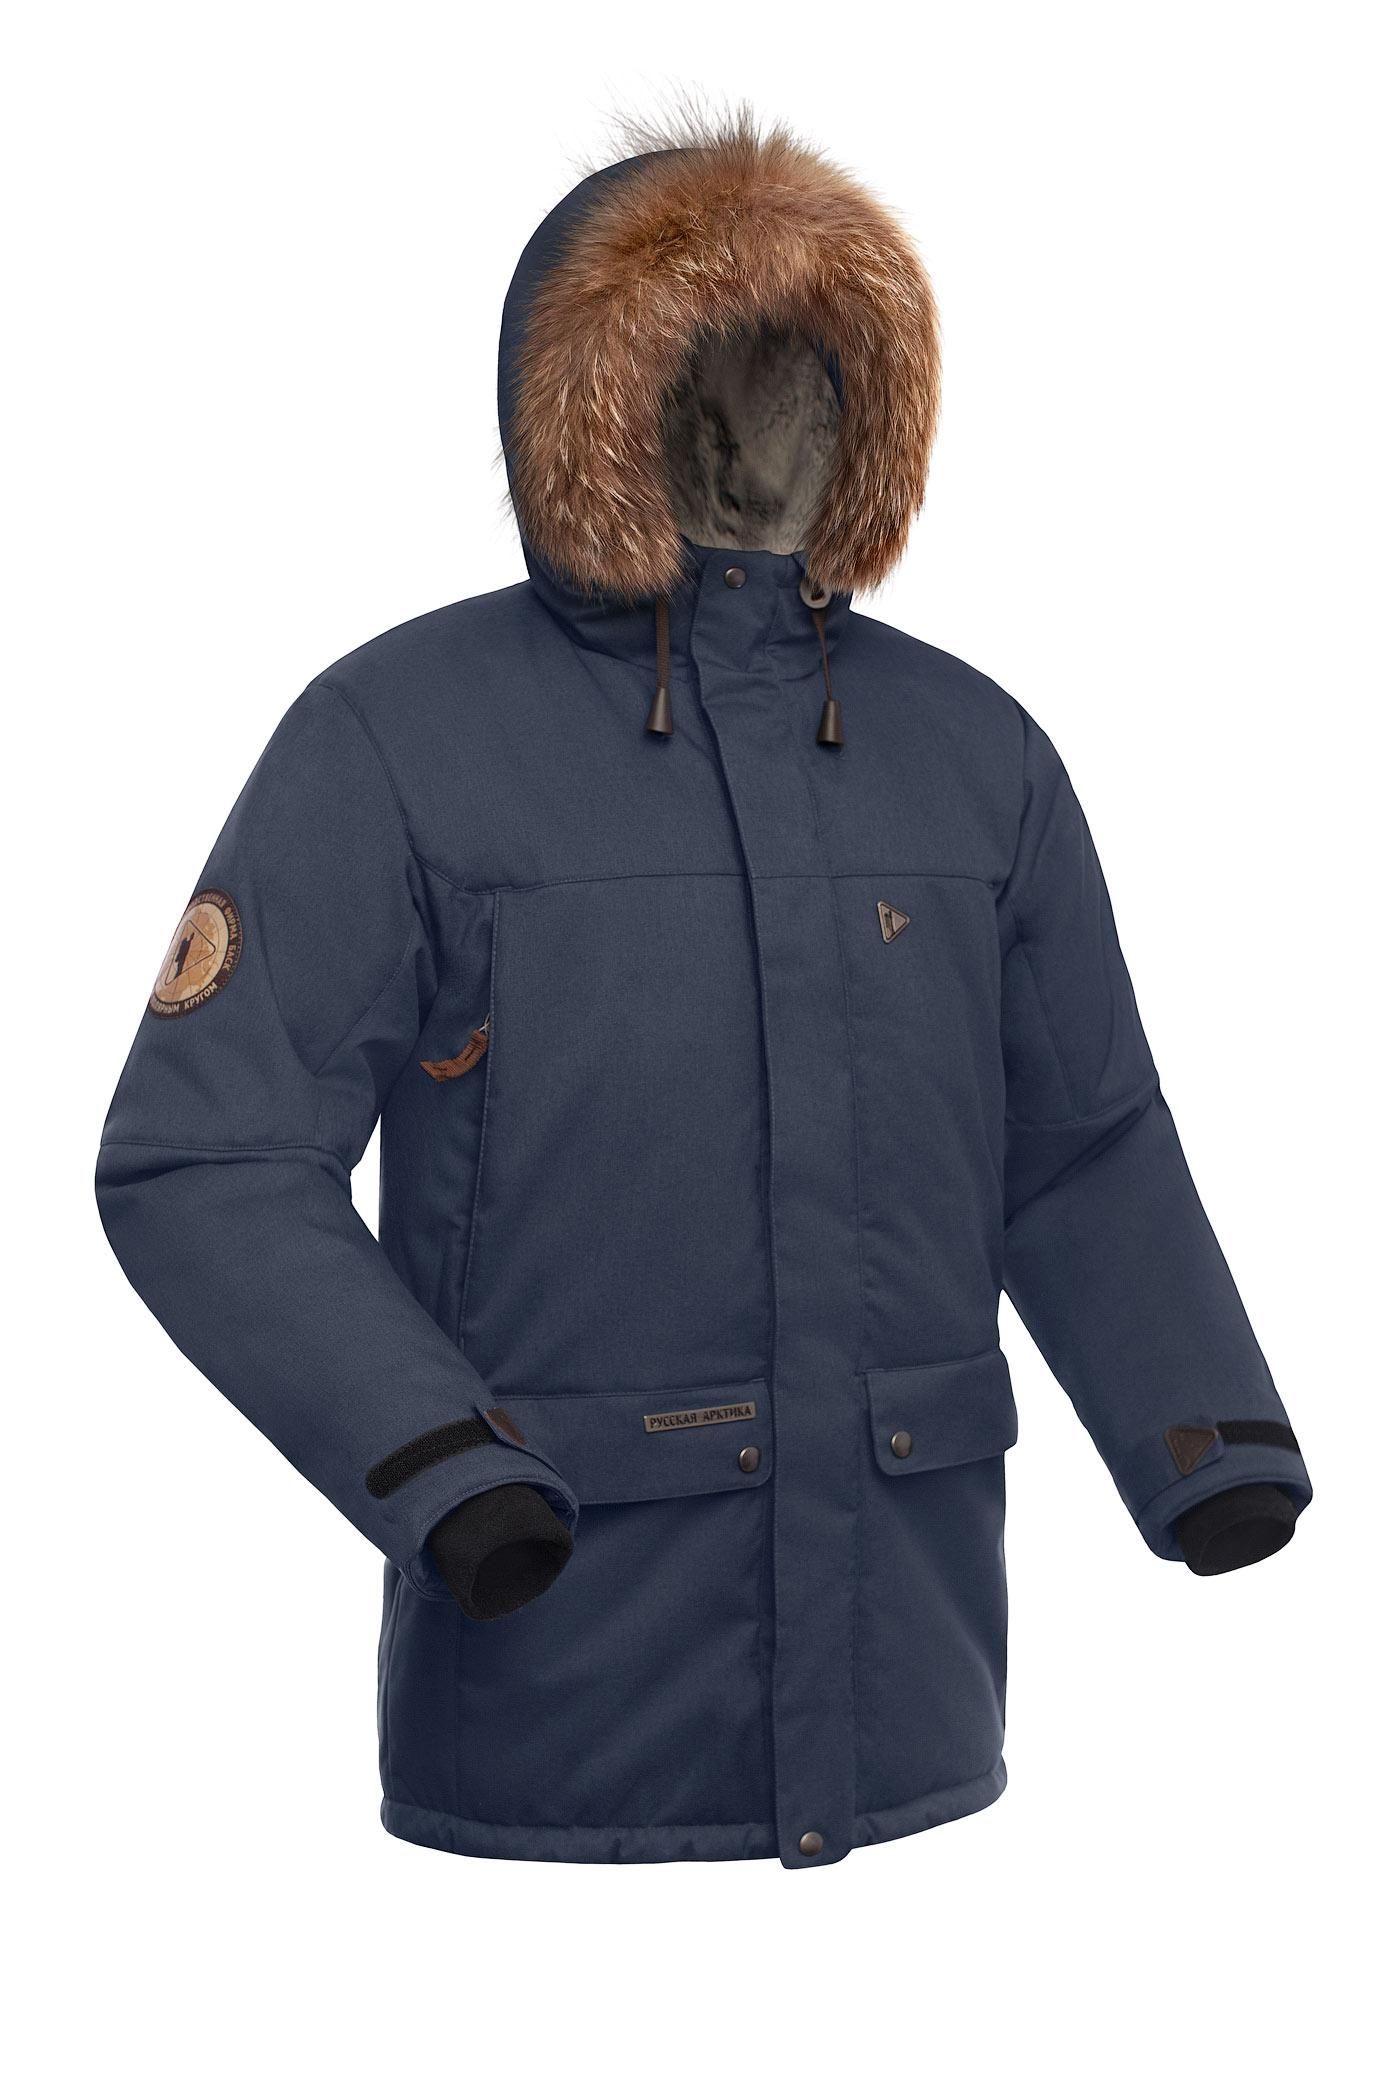 Купить Мужская куртка-парка Баск ARADAN синий тмн, Компания БАСК